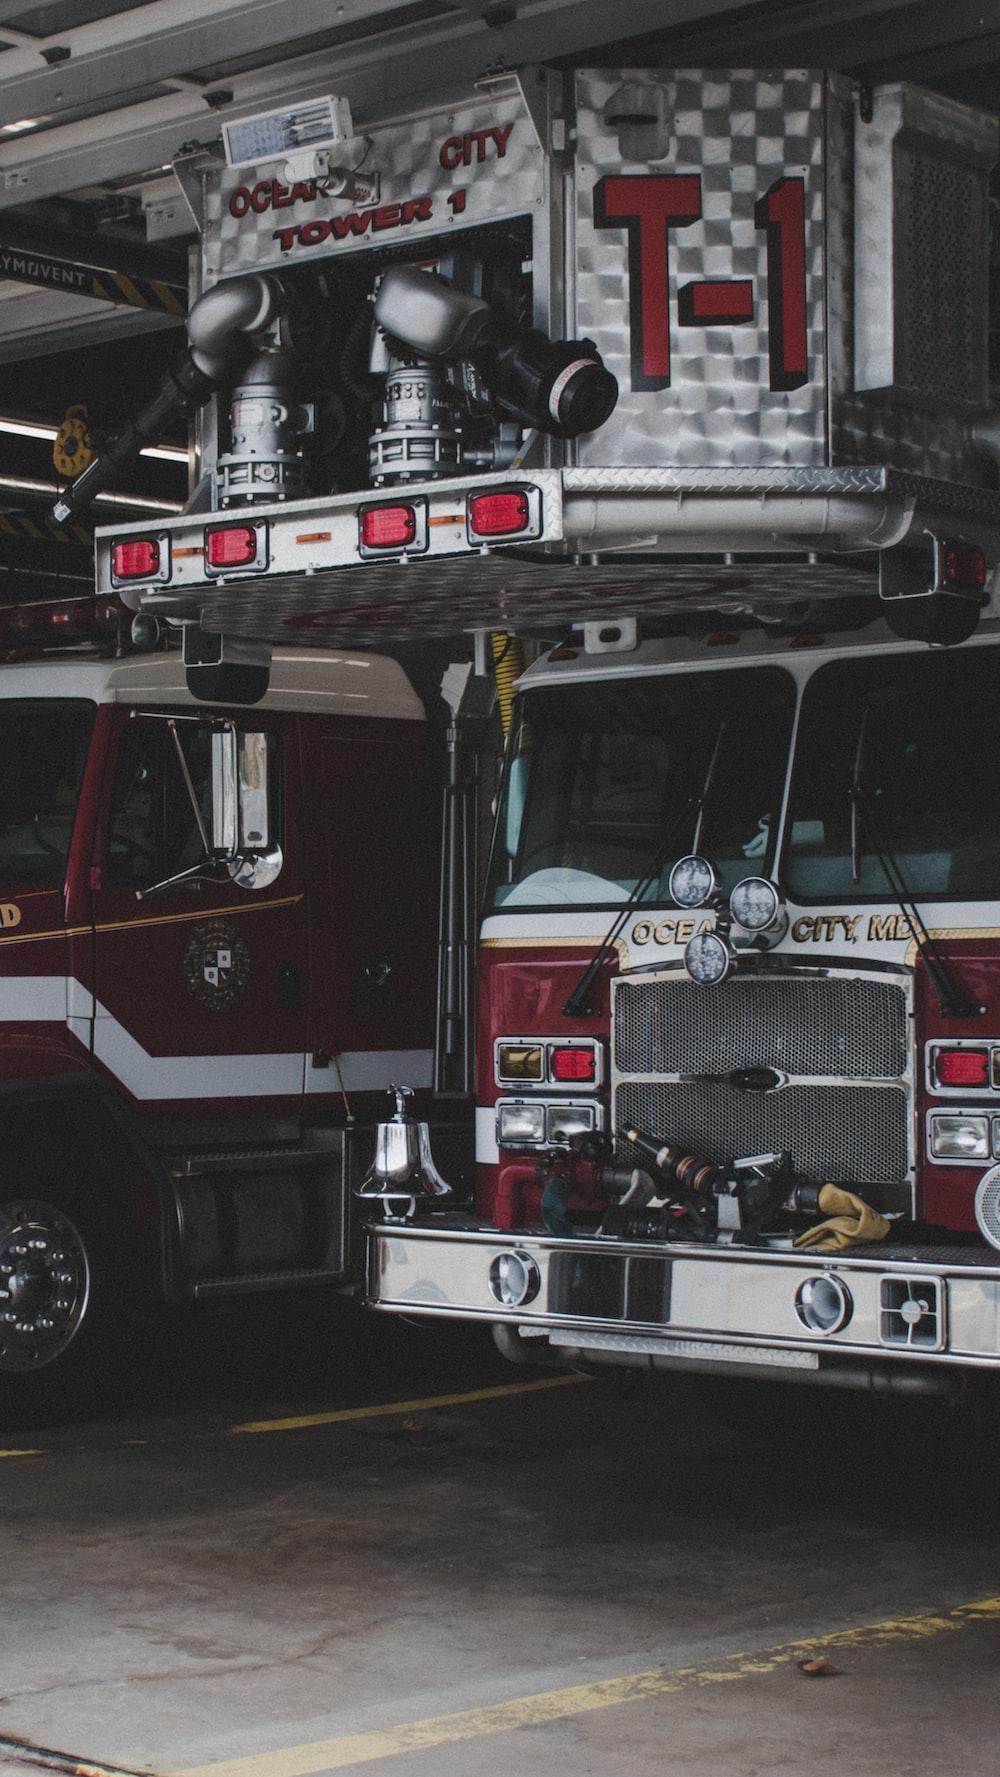 firetruck in building